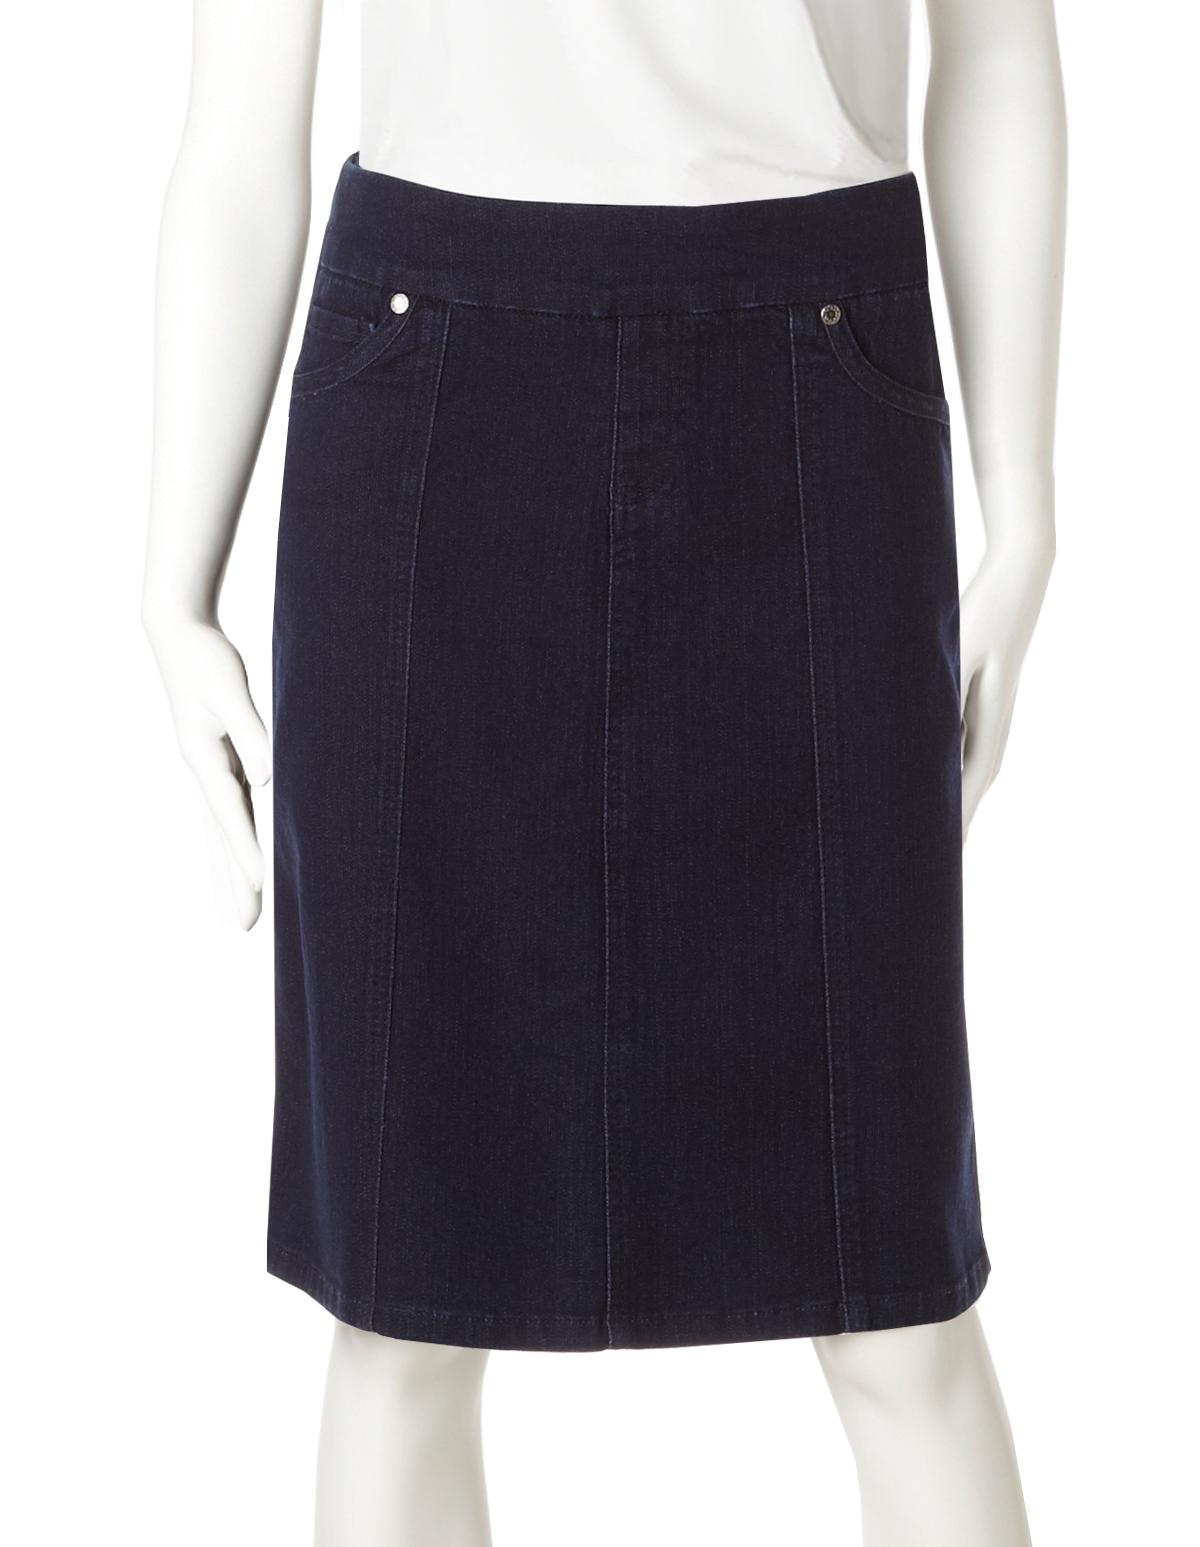 Stretch Denim Jeans Pencil Skirt Indigo Dark Blue Stitch Pocket NEW 12-24